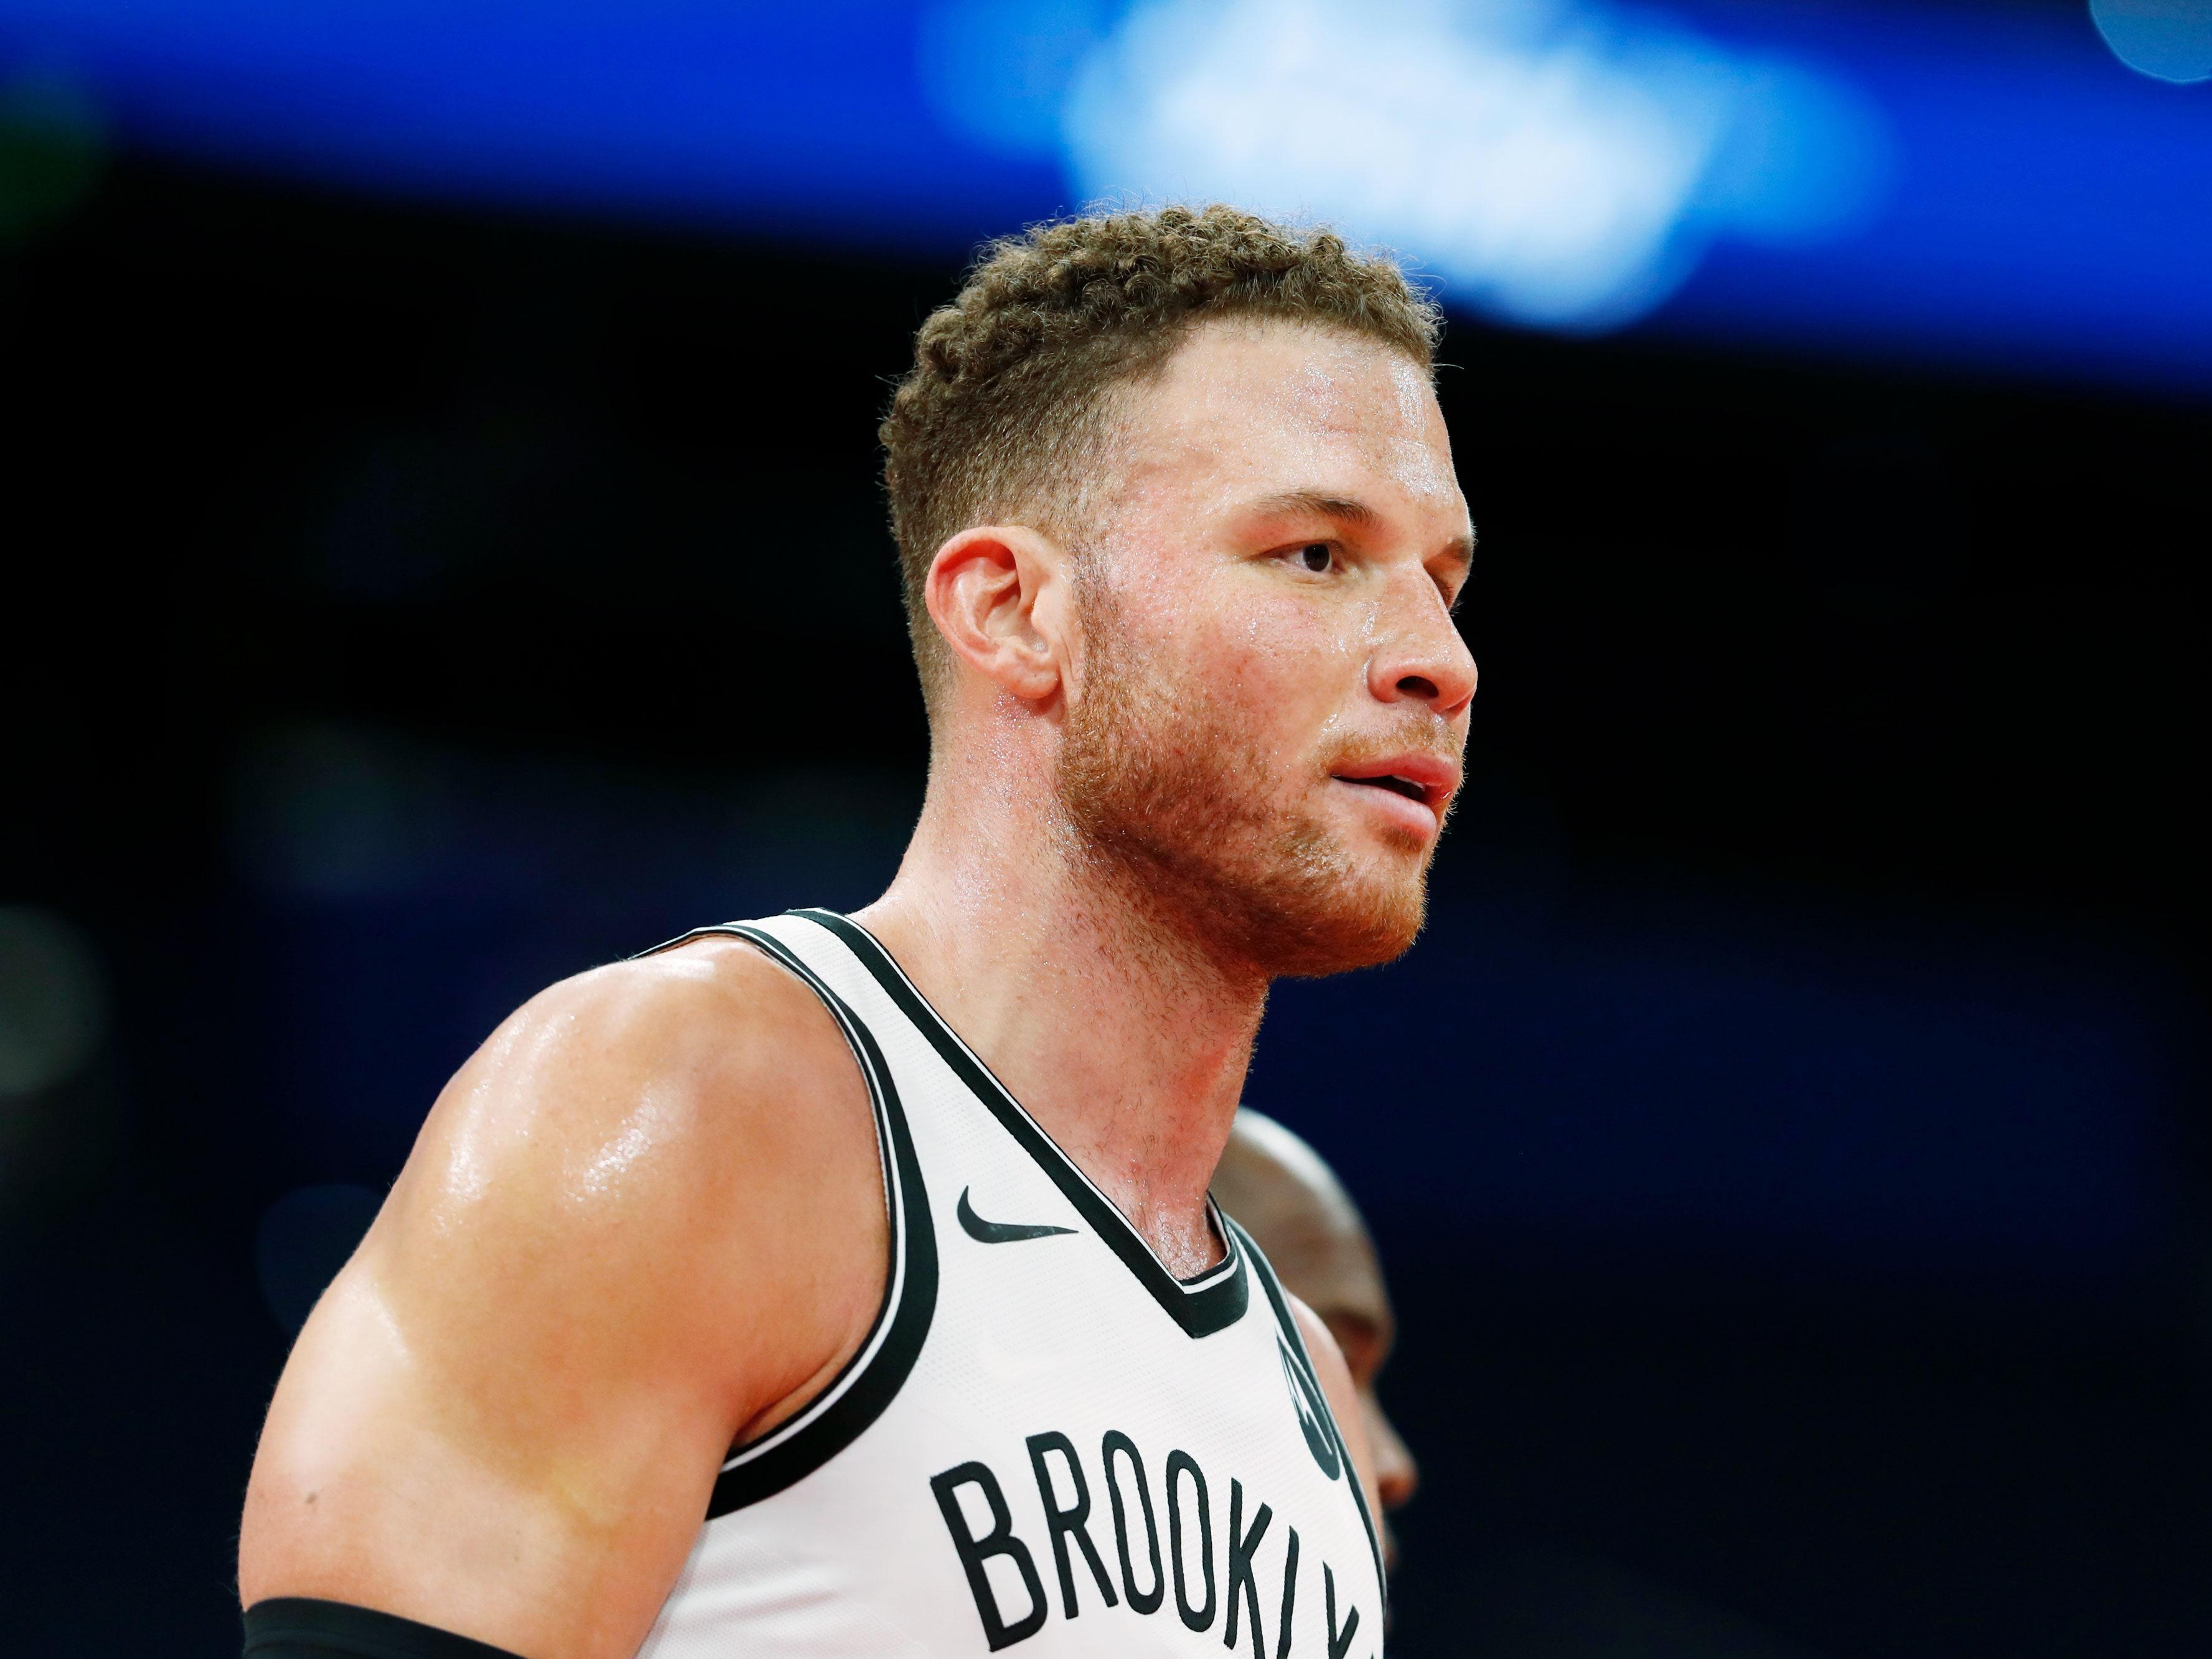 BR:篮网可能会留不住格里芬,有传言称后者可能会去热火